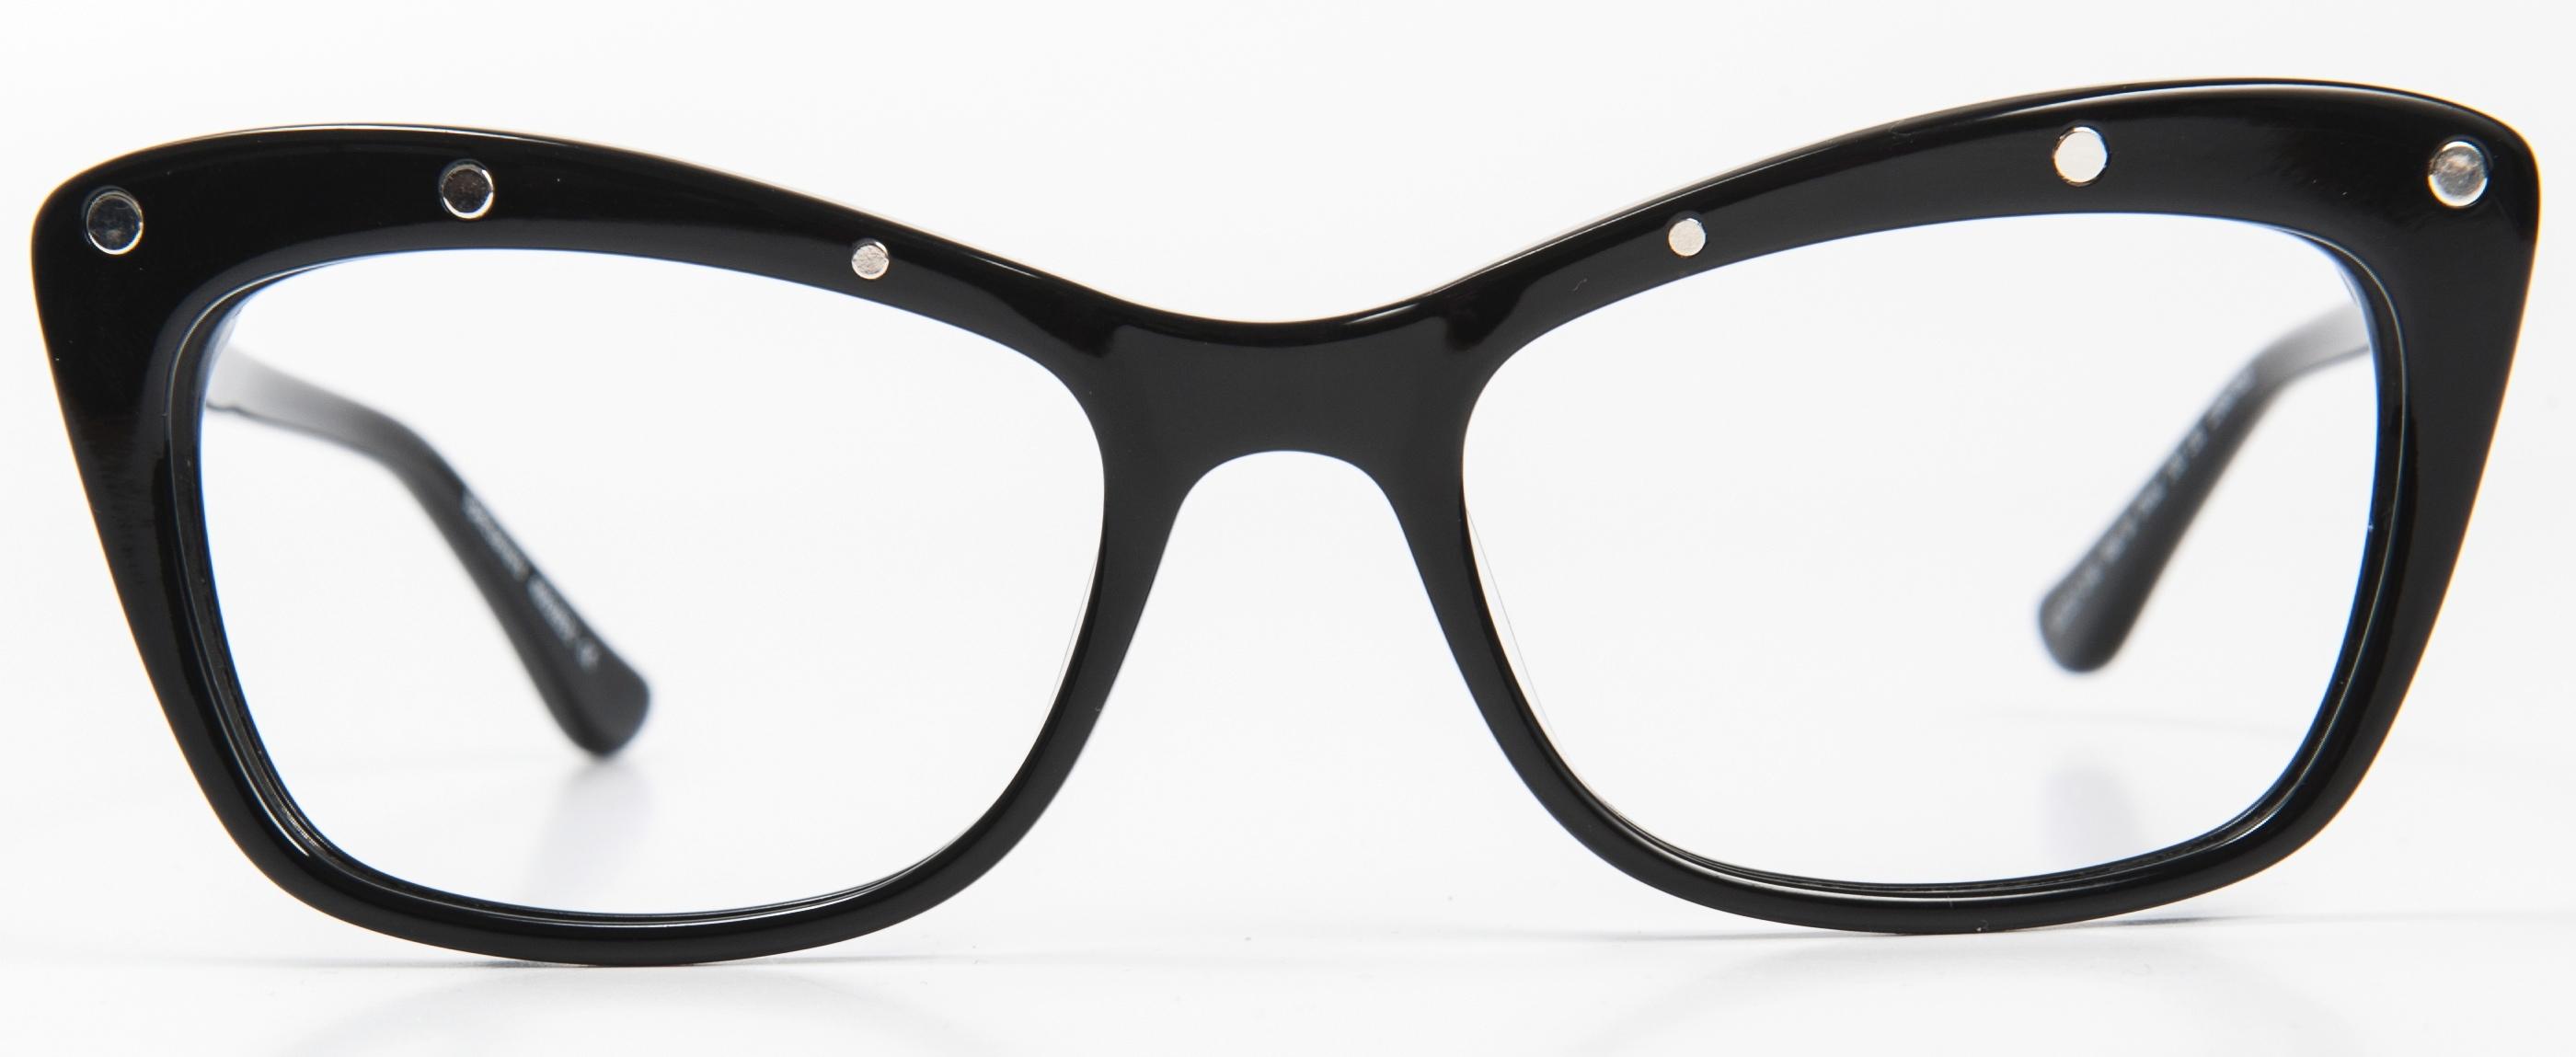 Specsavers Mens Titanium Frames | United Nations System Chief ...